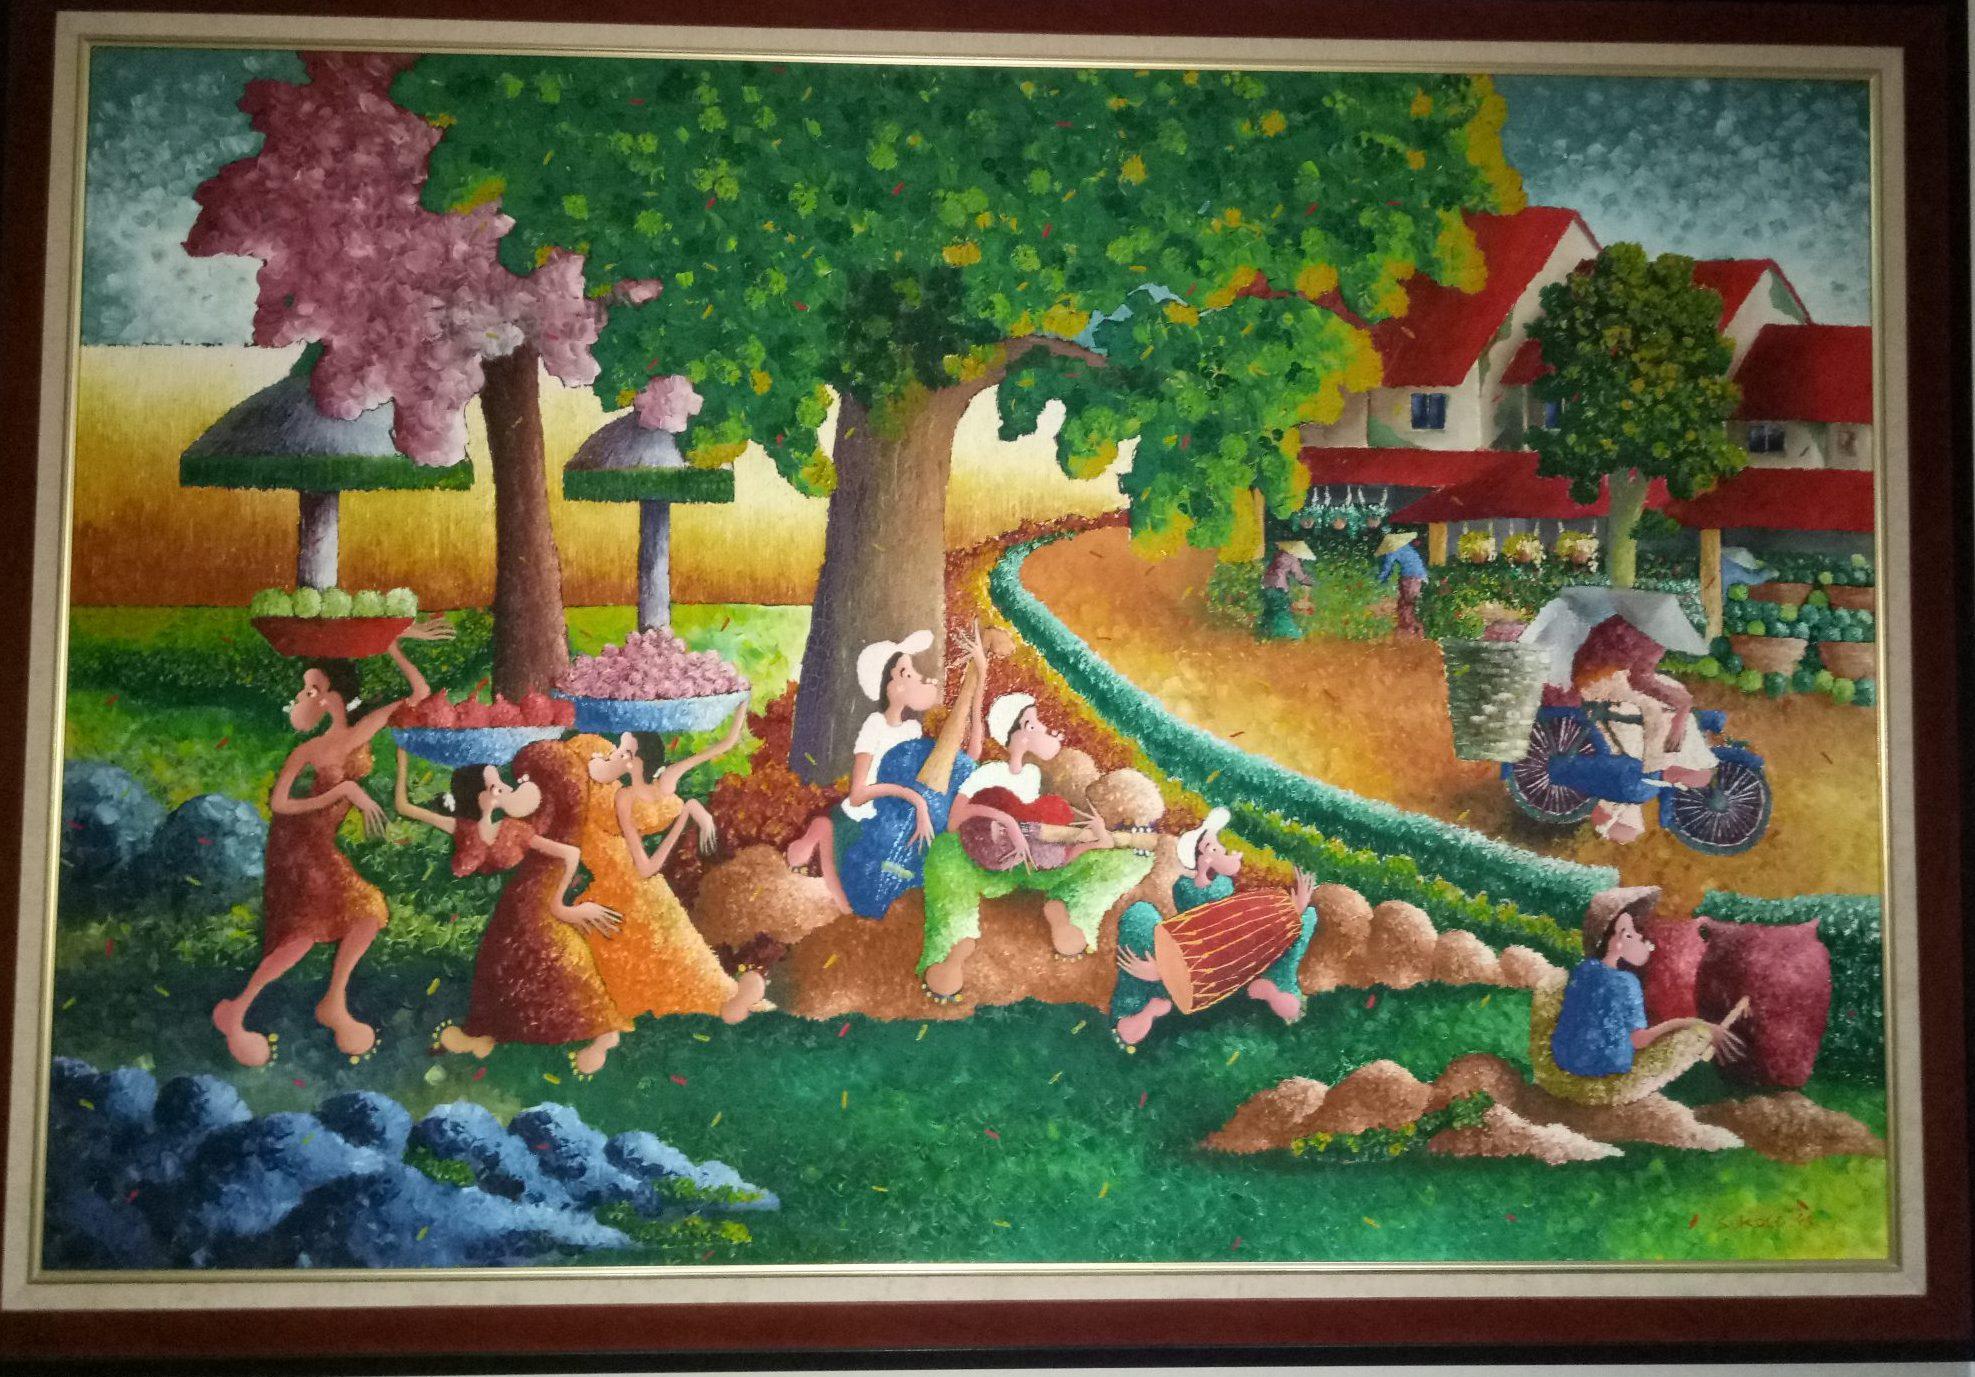 Suasana Kampung, Artist: Sukoco Wibowo (2009), oil on canvas